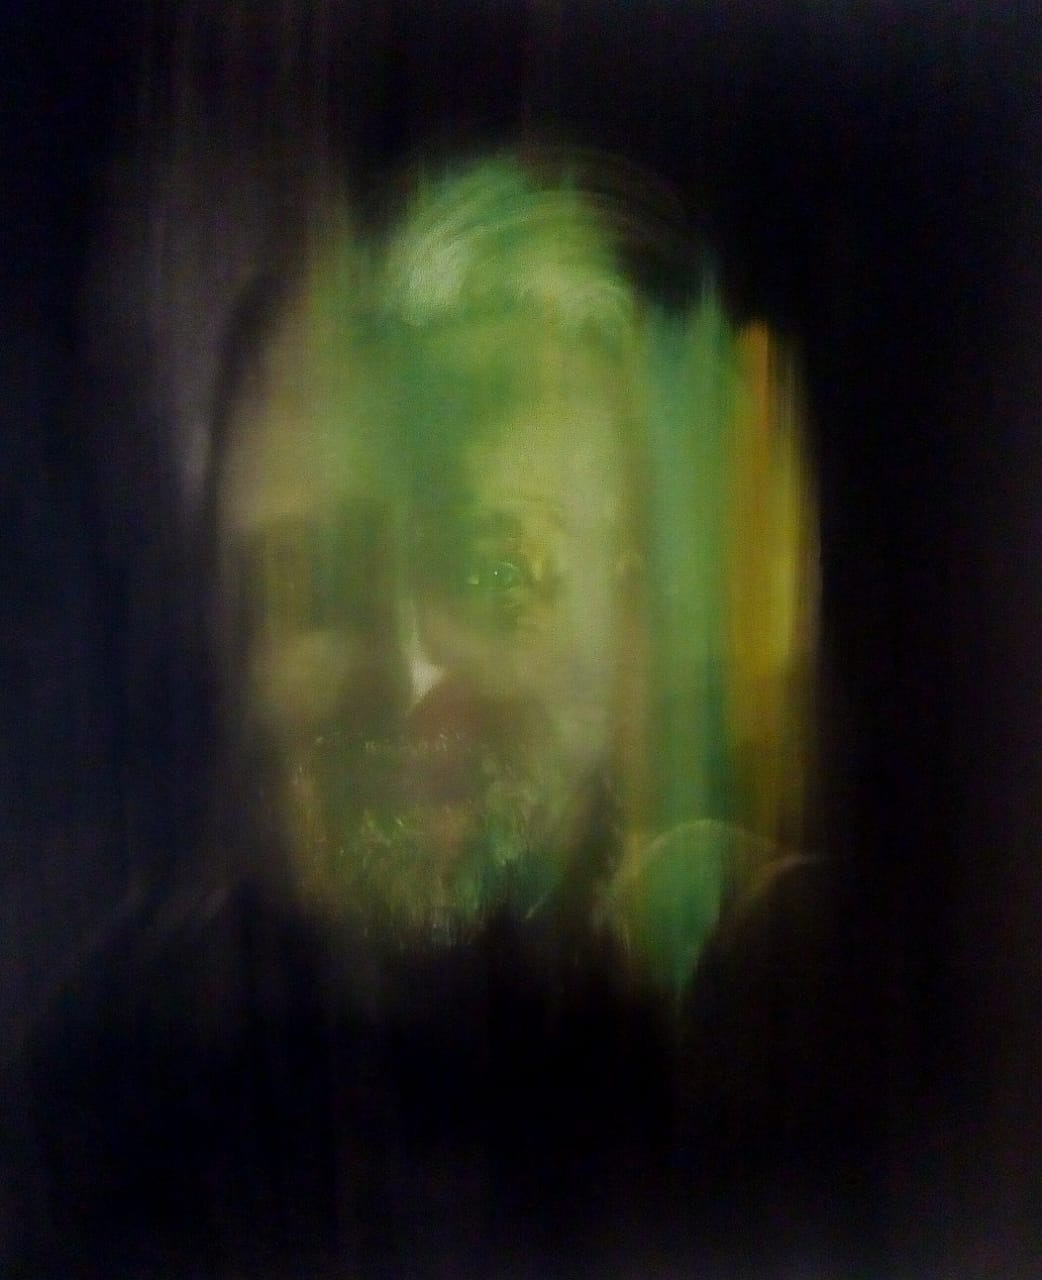 DIEGO LINARES Autorretrato. Óleo sobre lienzo. 1m x 1m  Año 2019. .JPG